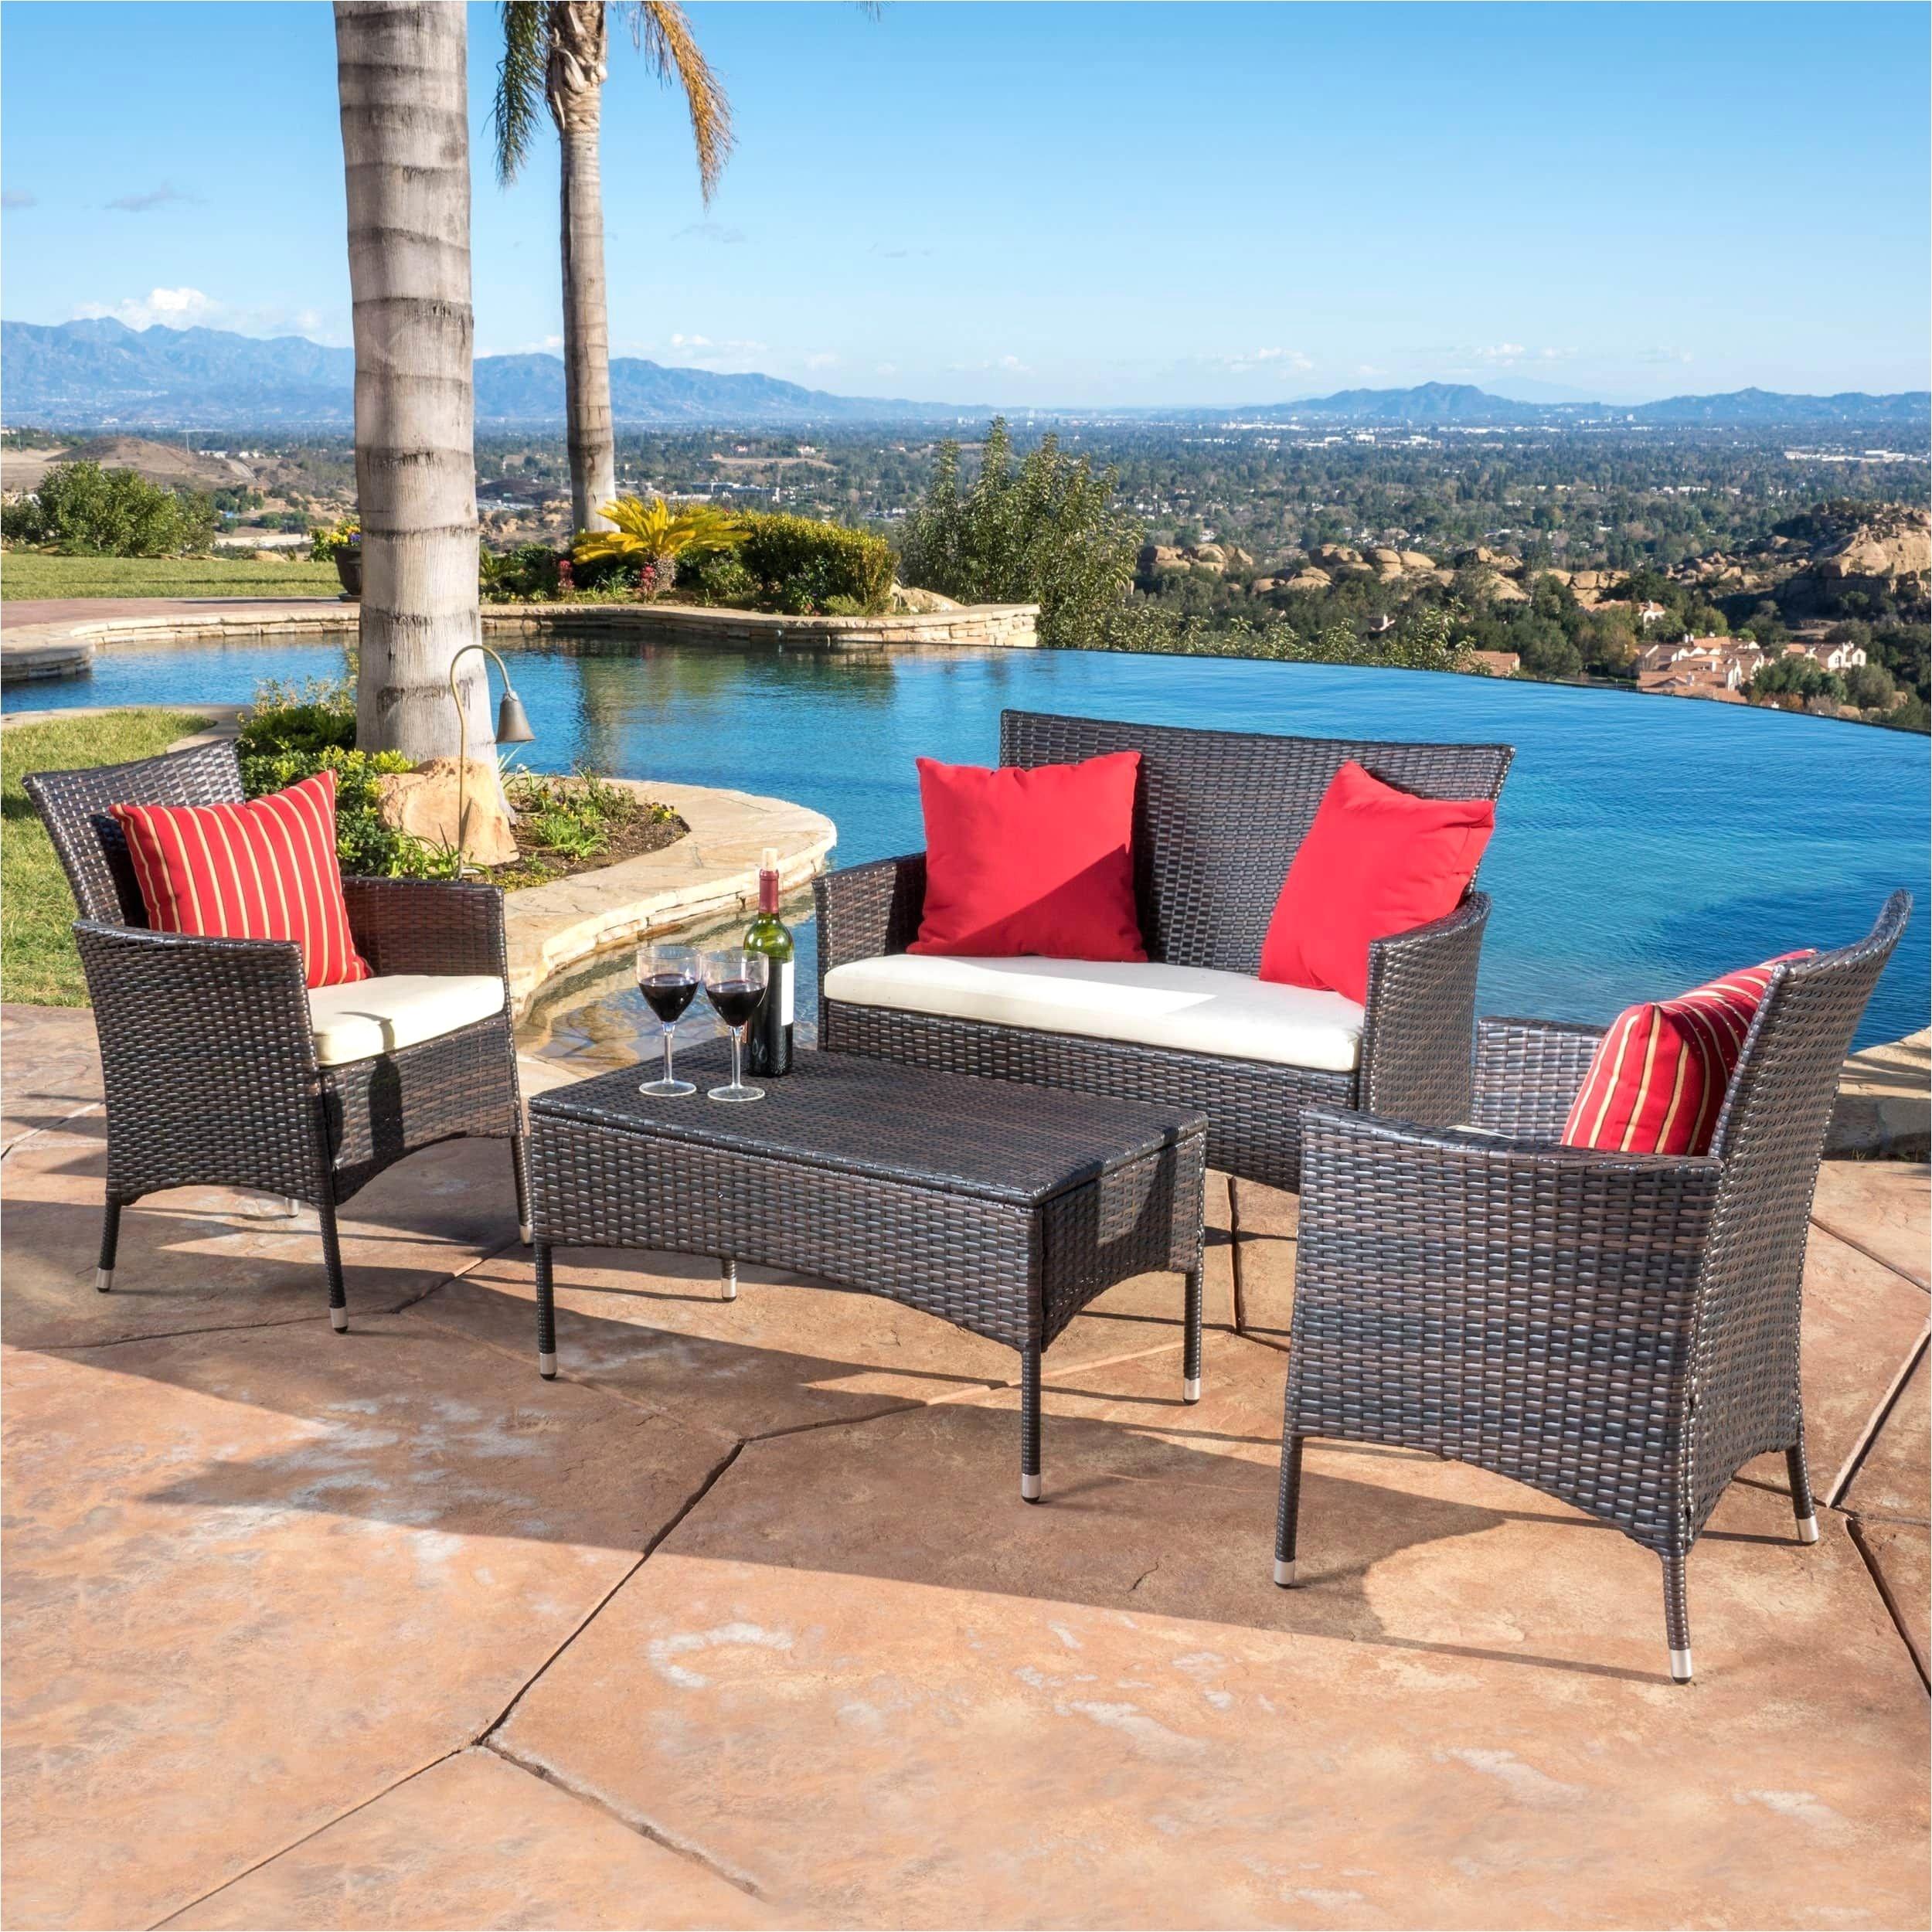 Rv Floor Mats Outdoor Patio Tiles Awesome Rv Patio Mat Luxury Rv Patio Mat